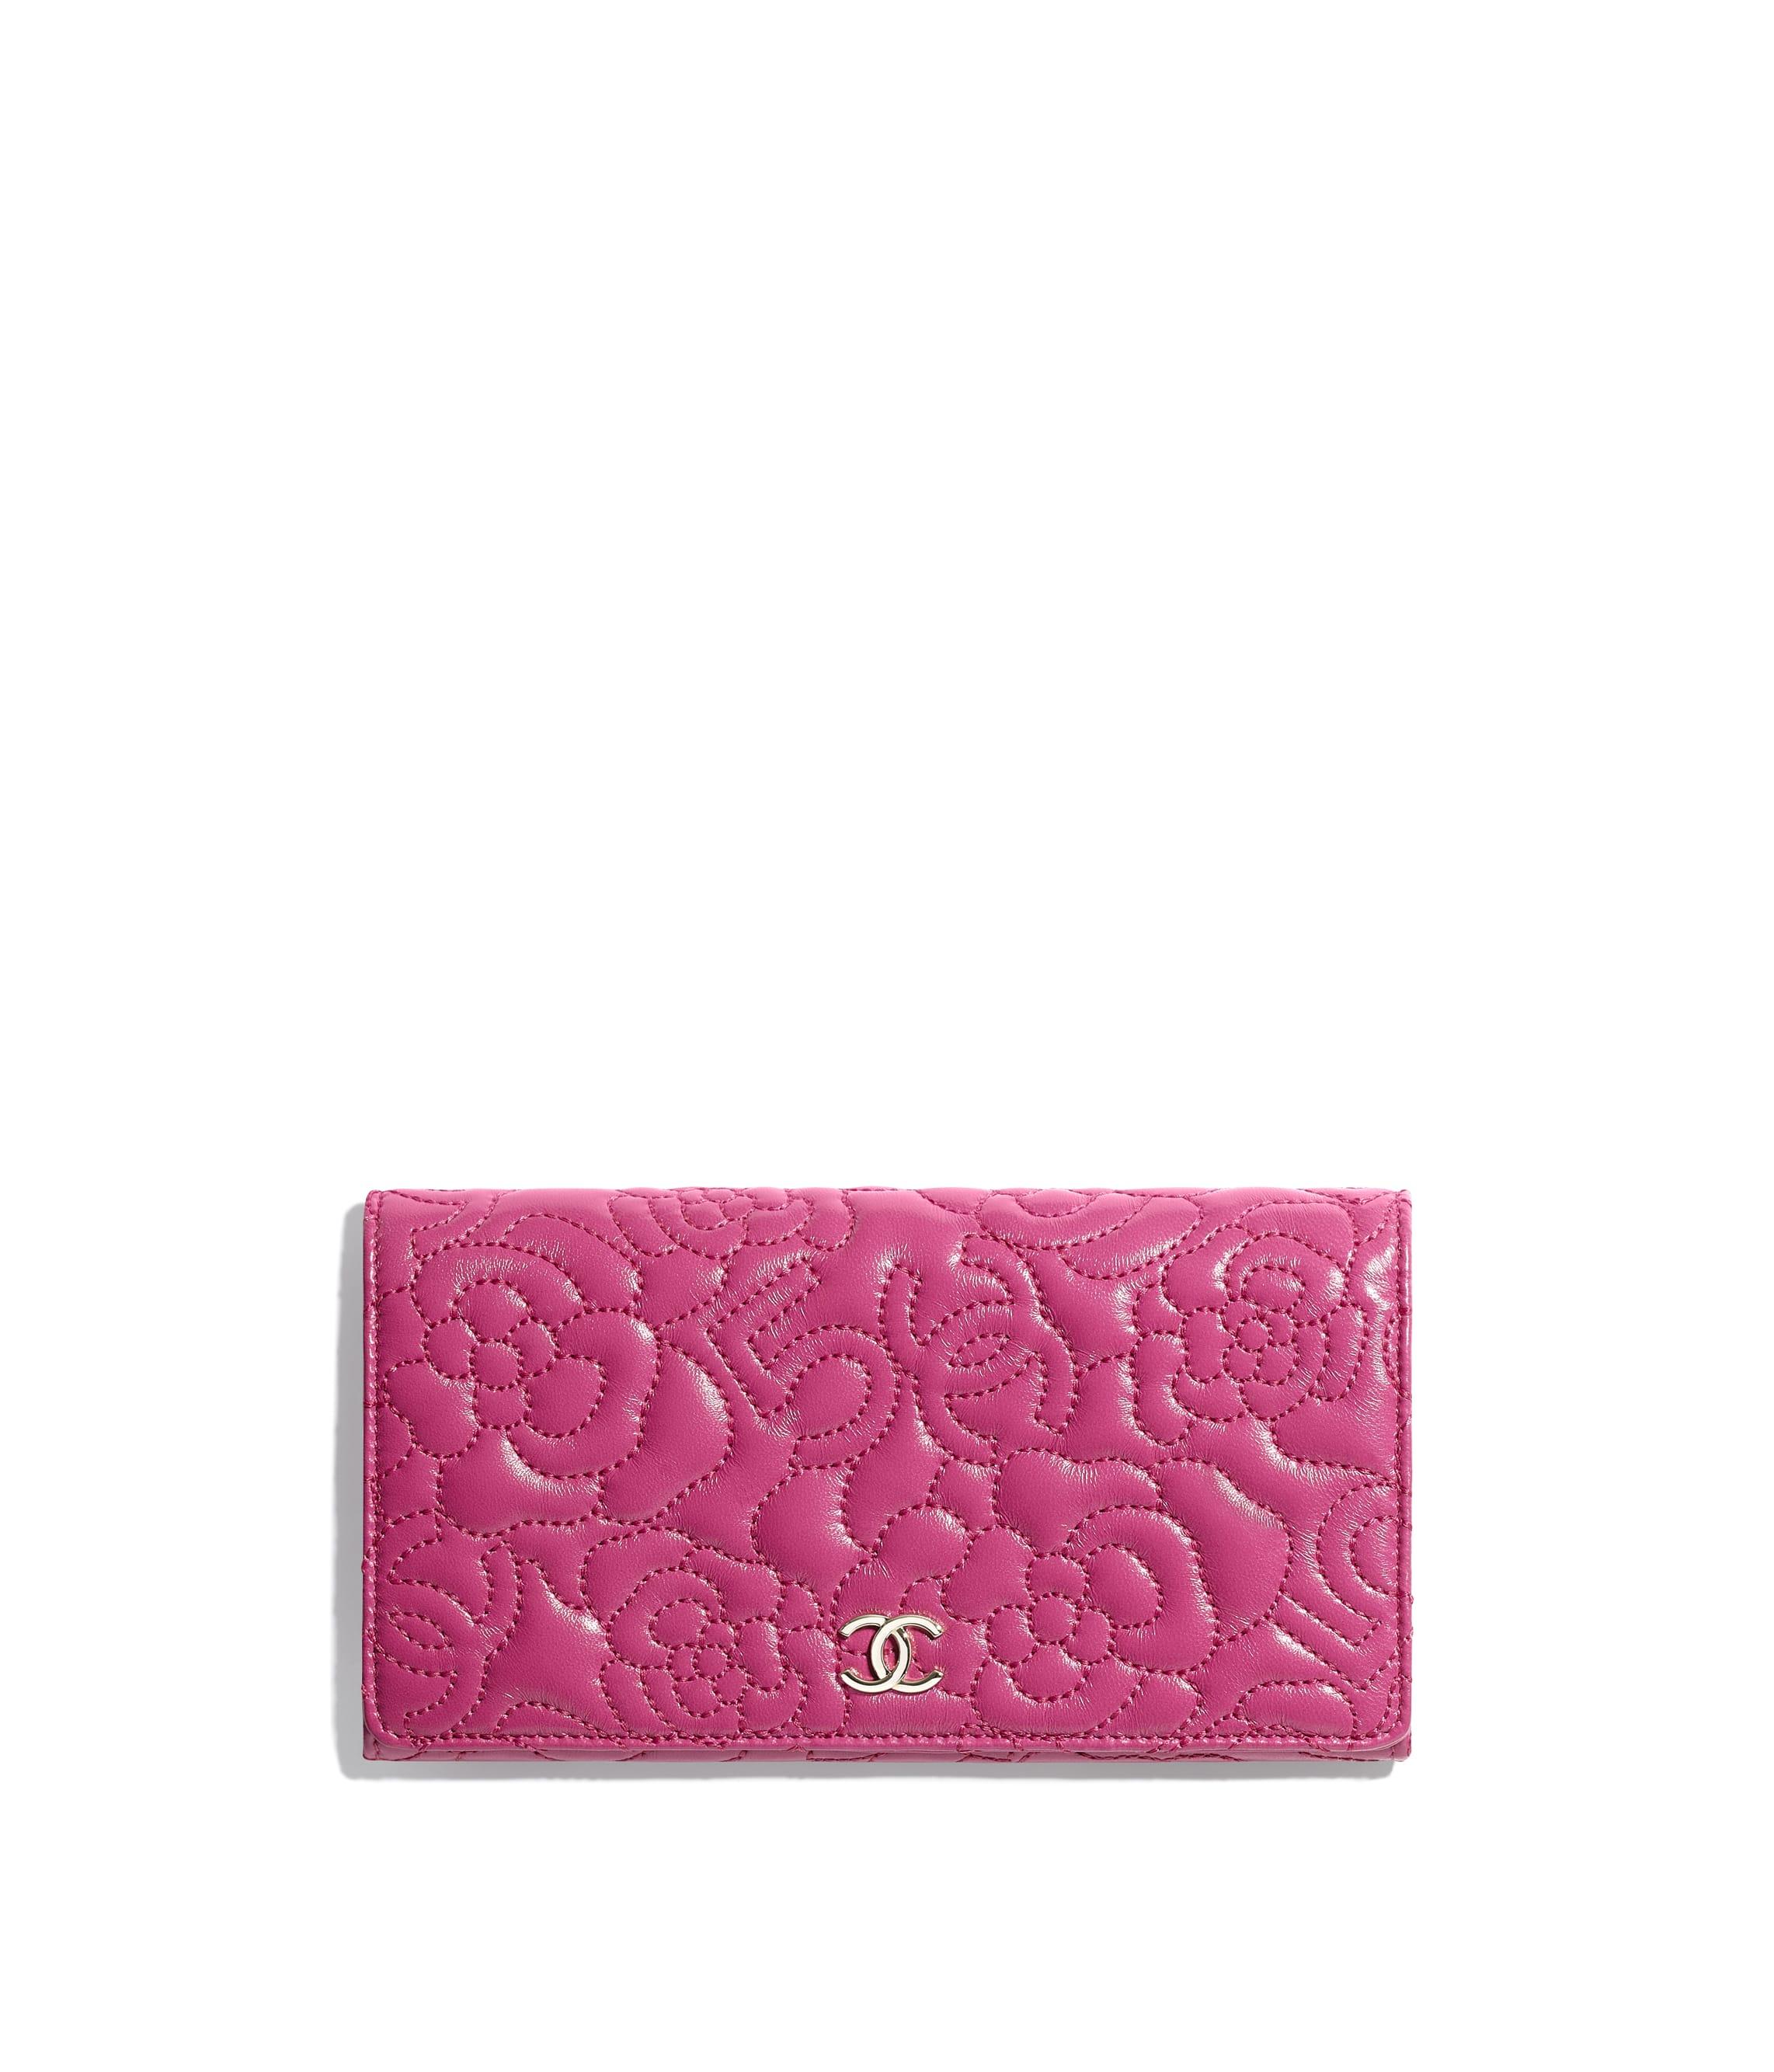 Flap Wallet